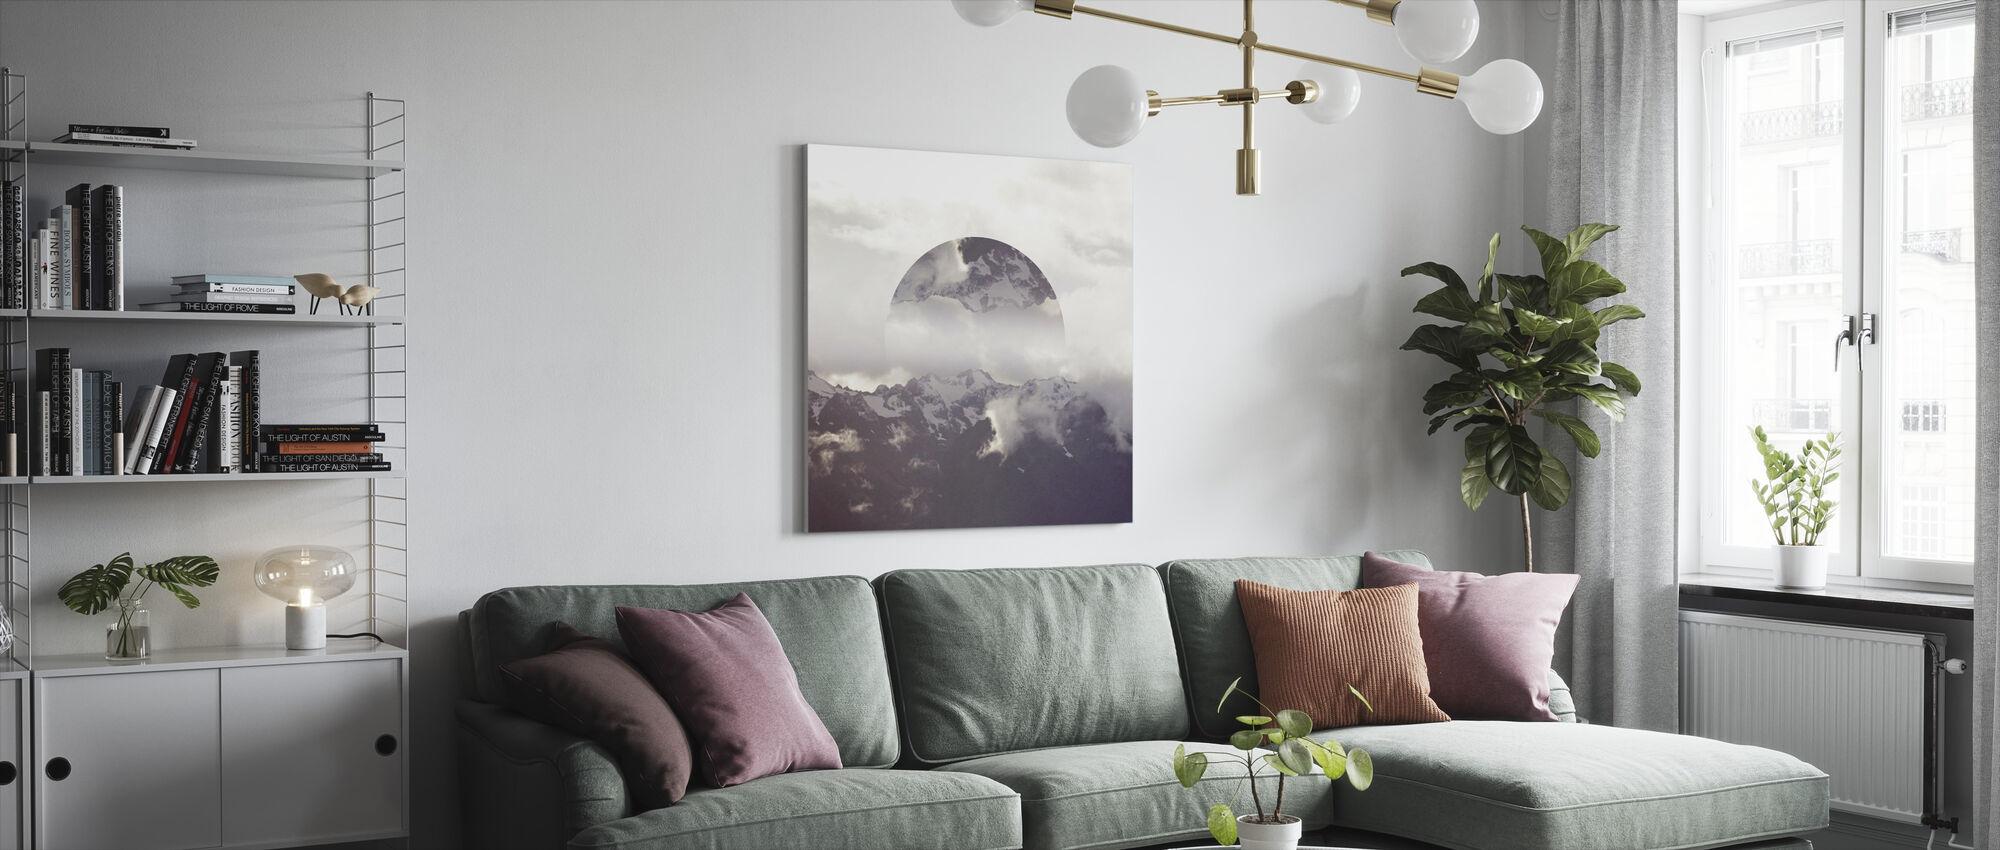 Reflected Landscape 2 - Canvas print - Living Room